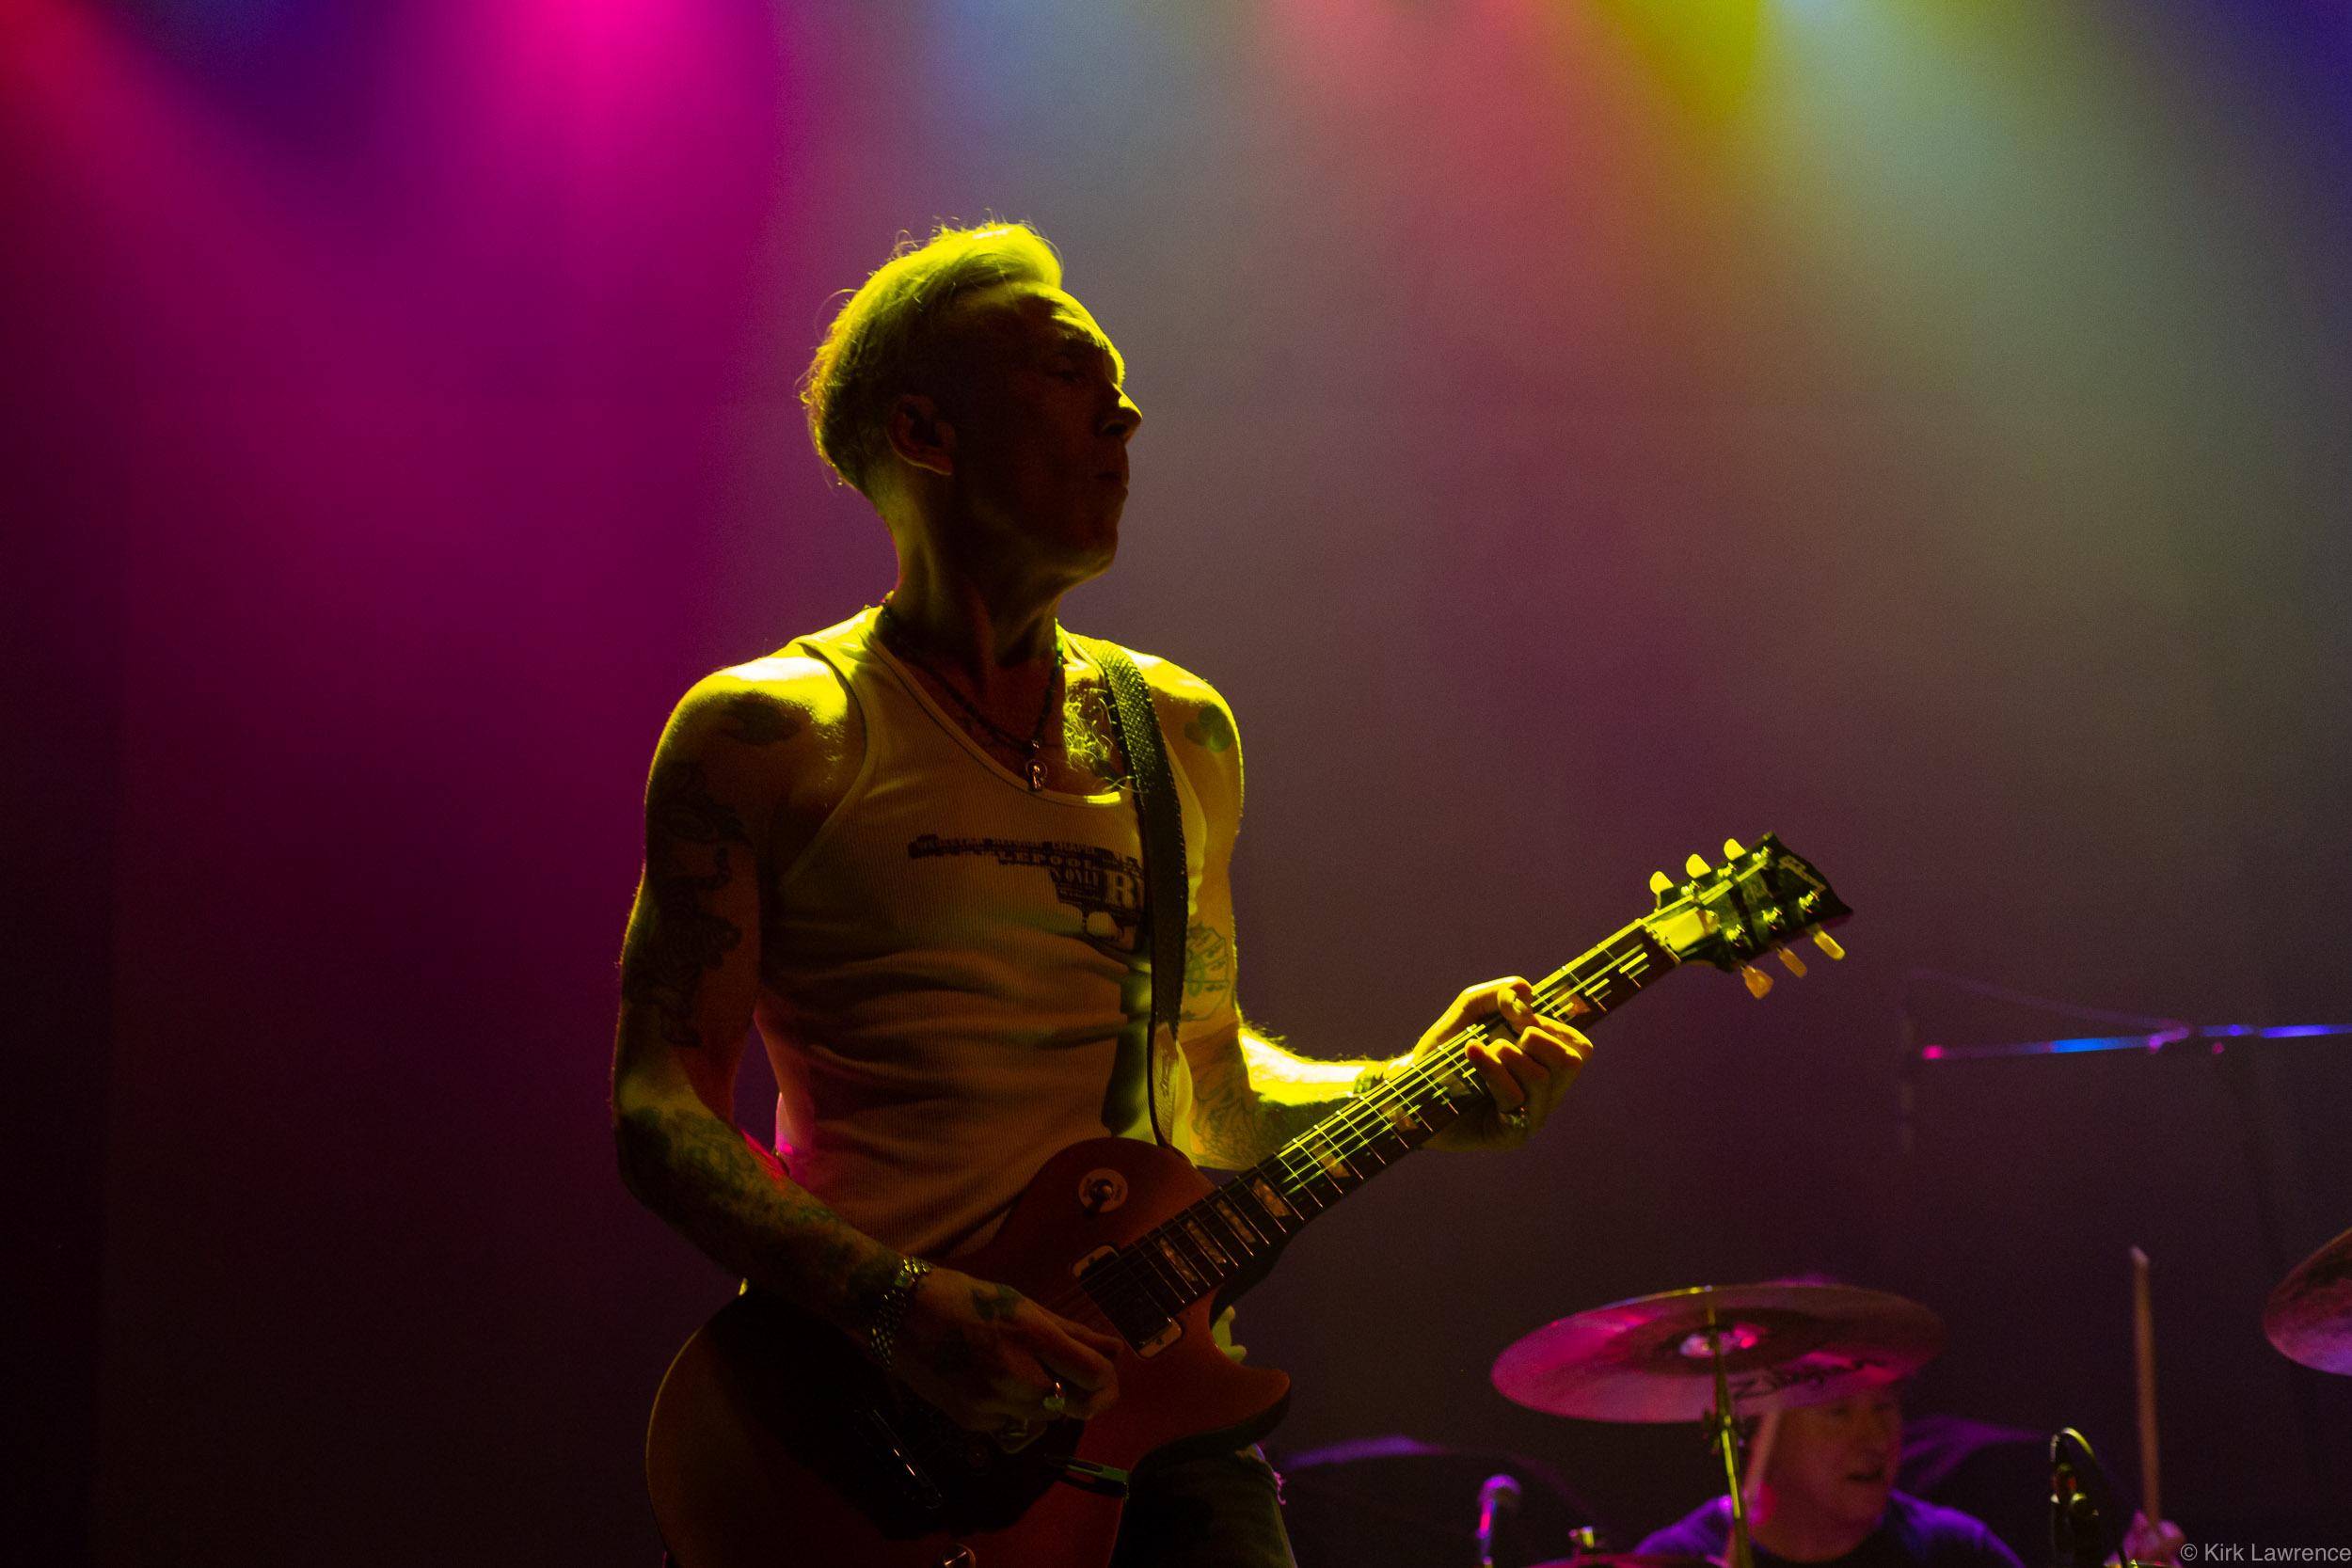 Adam_Roth_Gramercy_Theater_New_York_City_concert.jpg